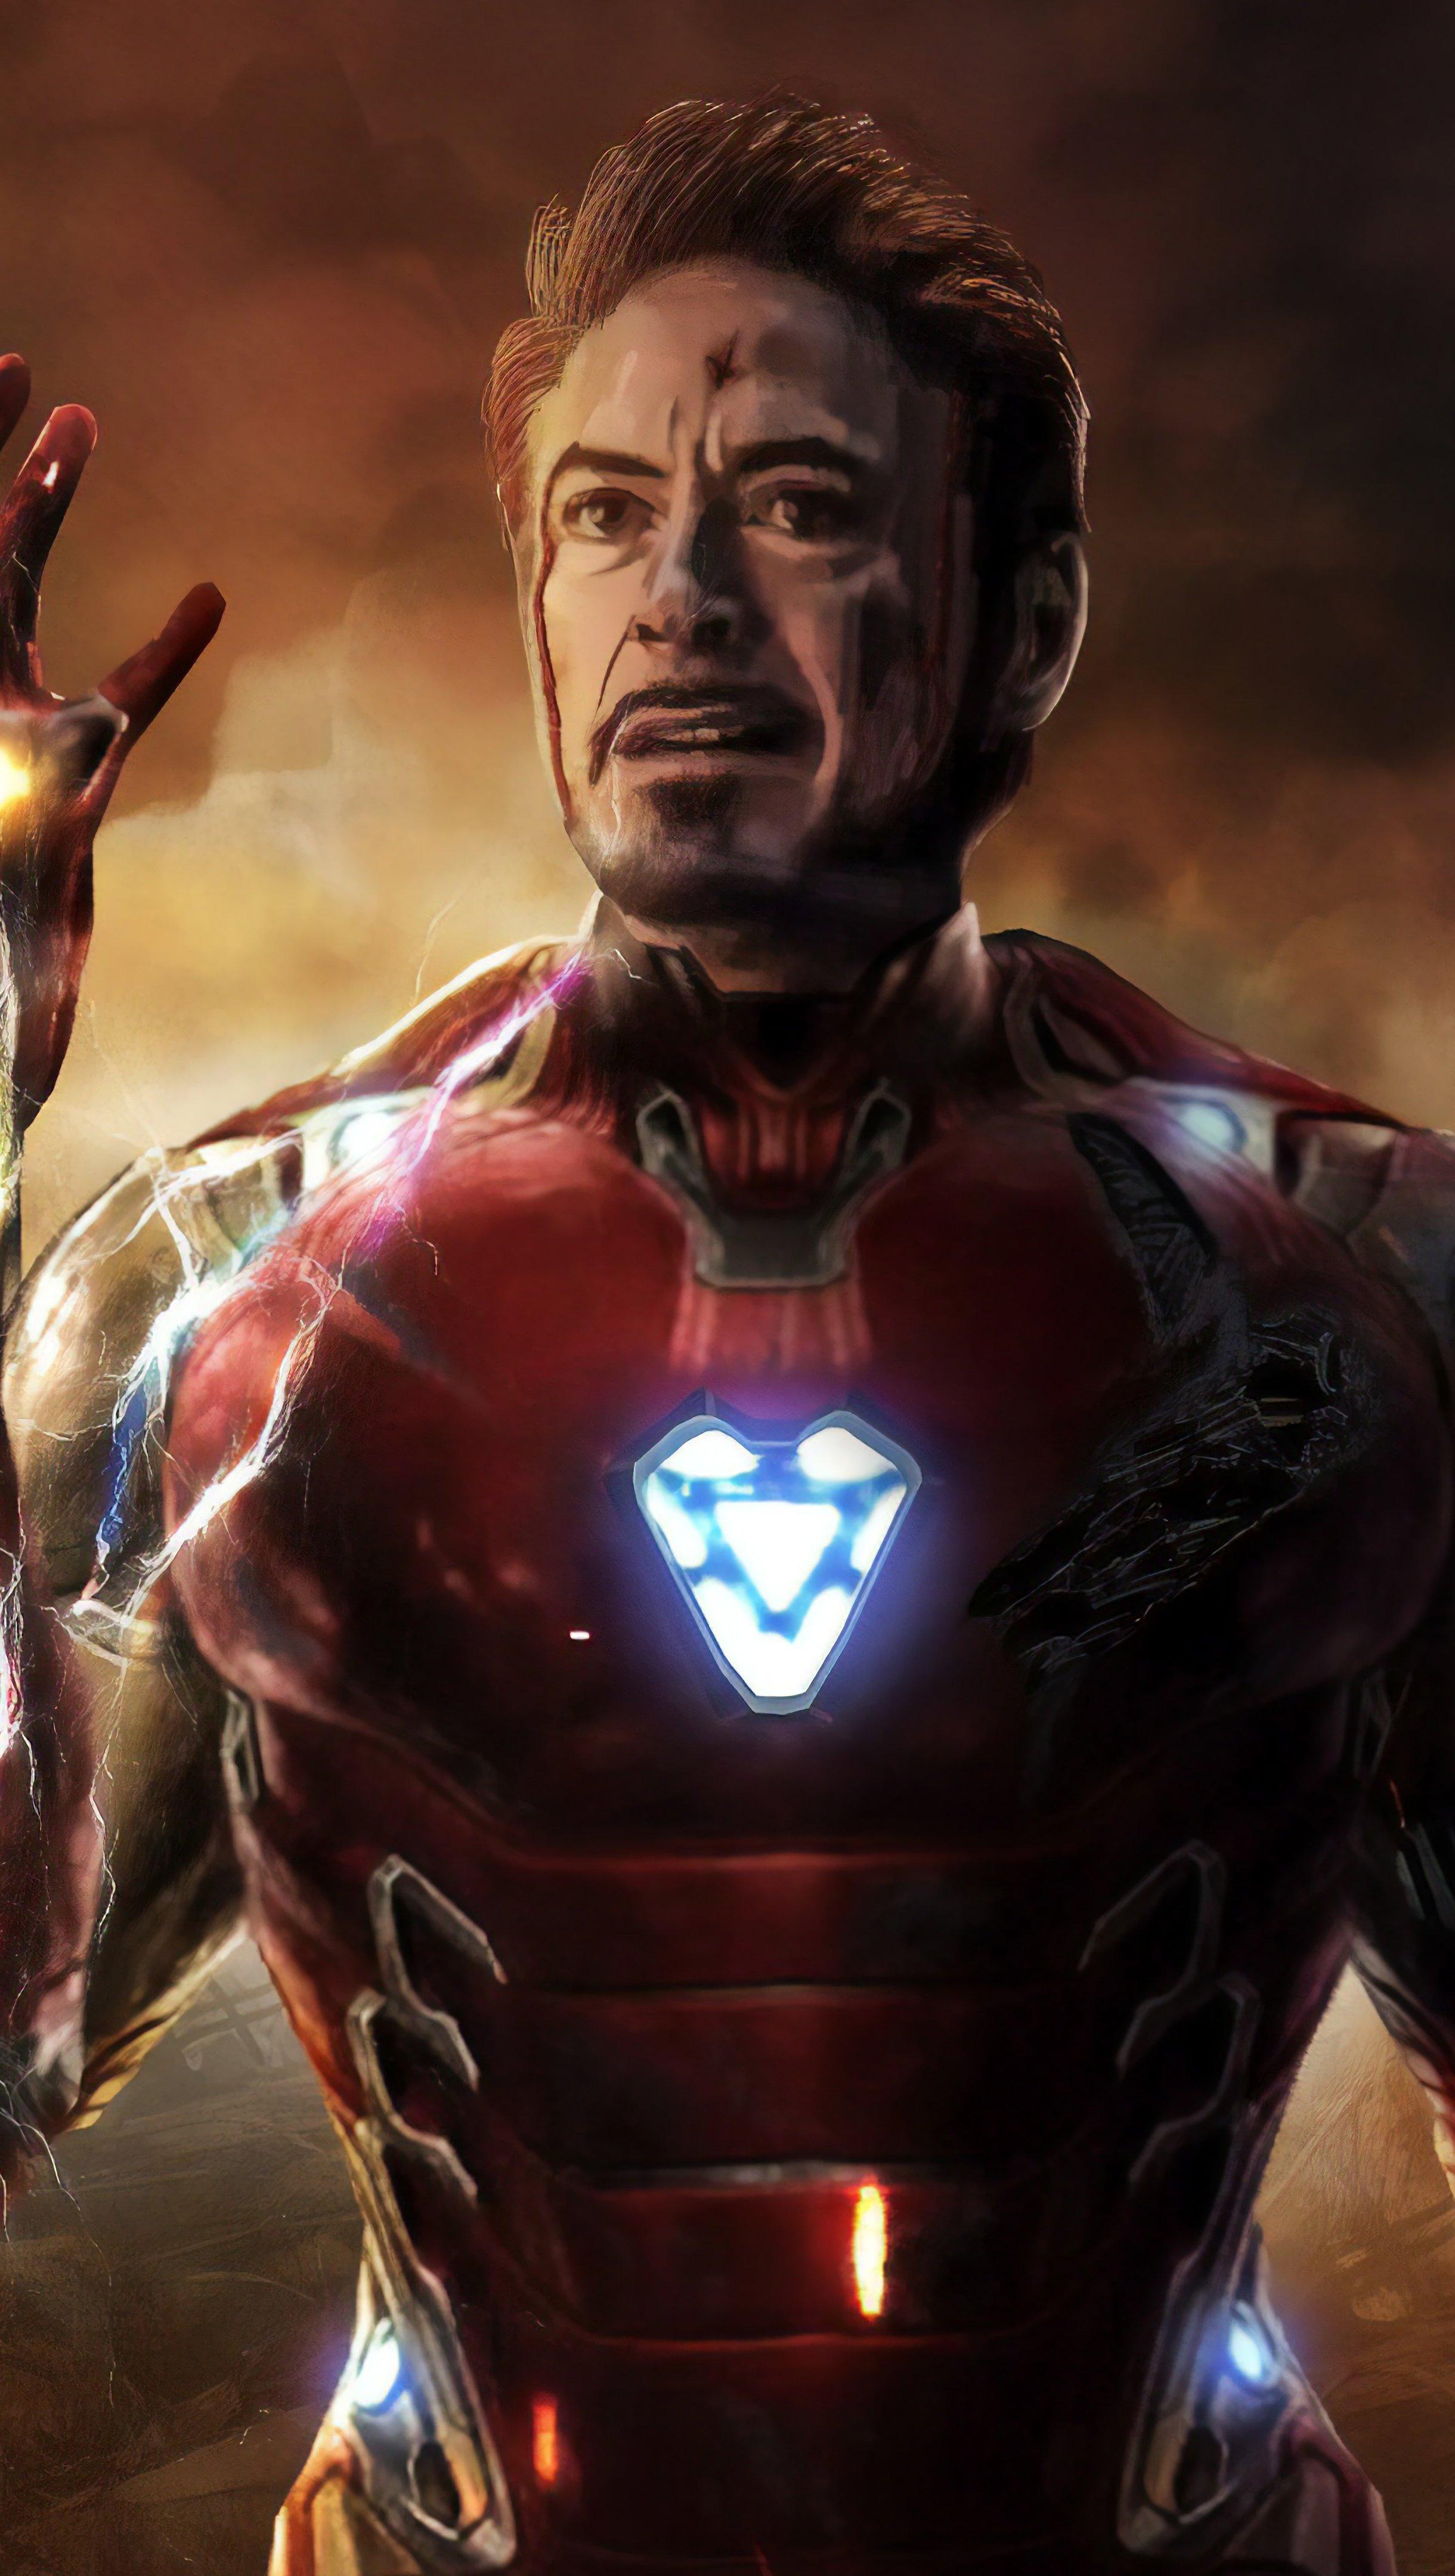 Fondos de pantalla Avengers Endgame Iron Man Tony Stark Gemas del Infinito Vertical